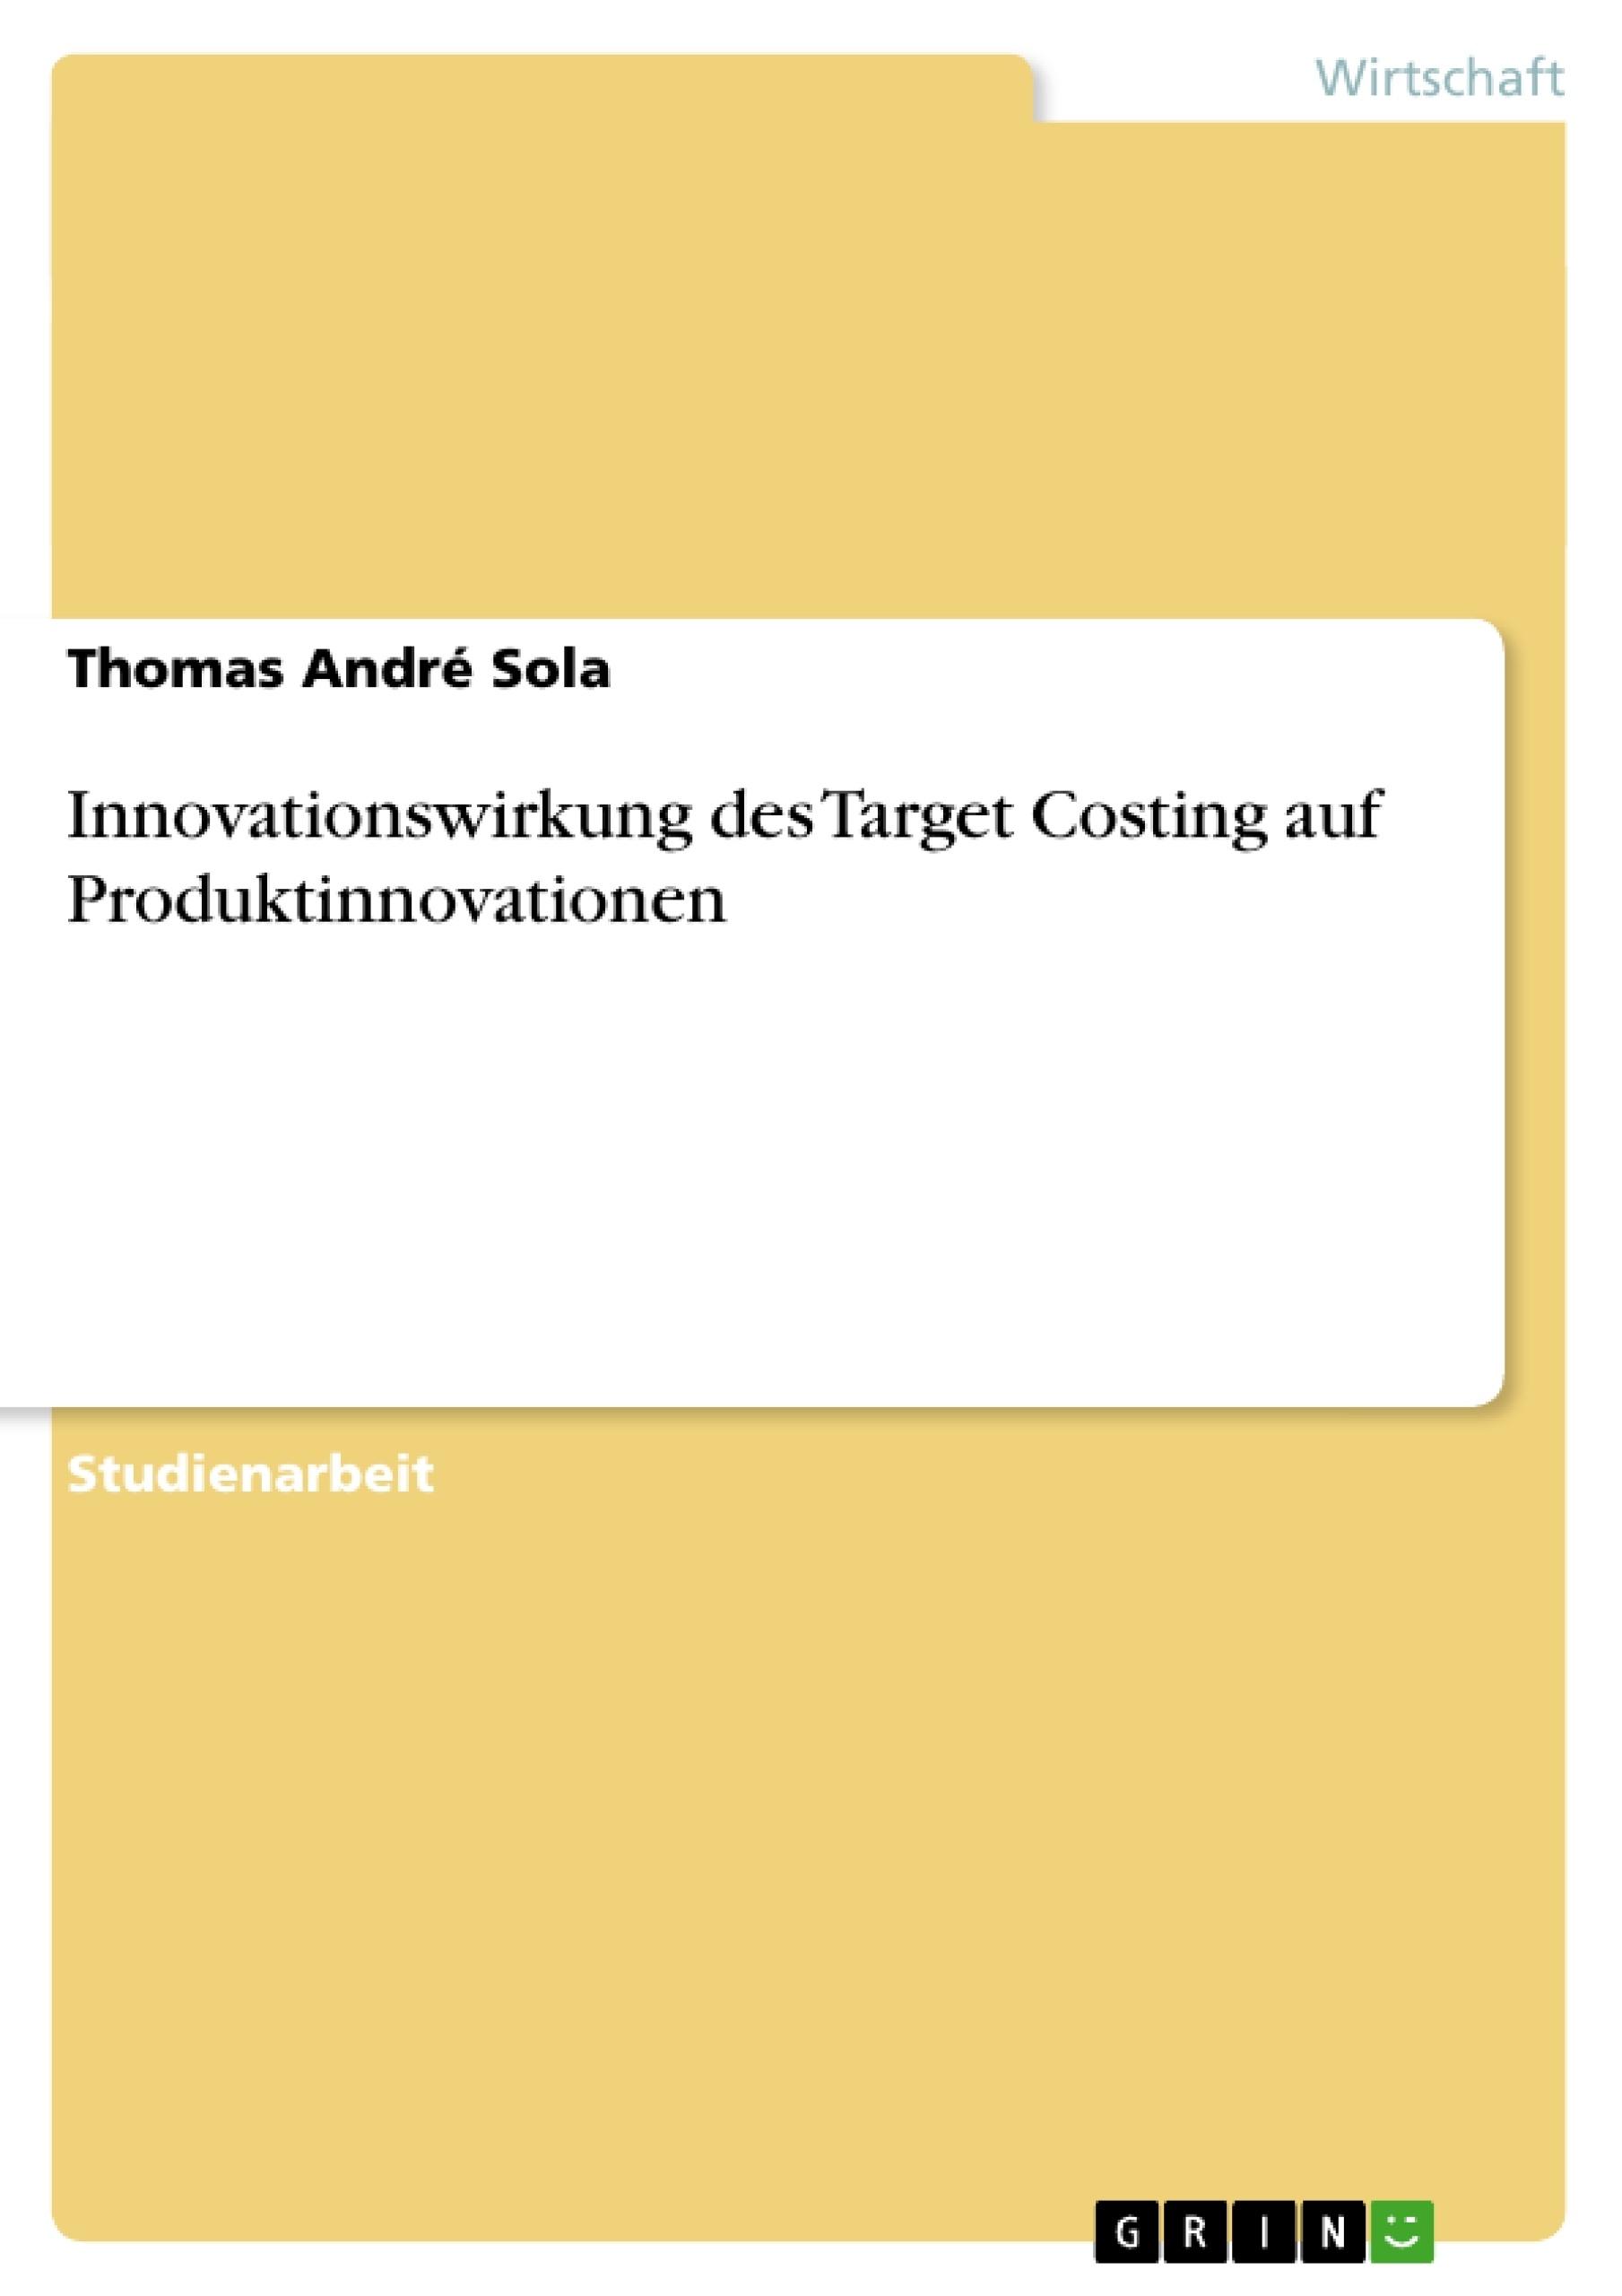 Titel: Innovationswirkung des Target Costing auf Produktinnovationen